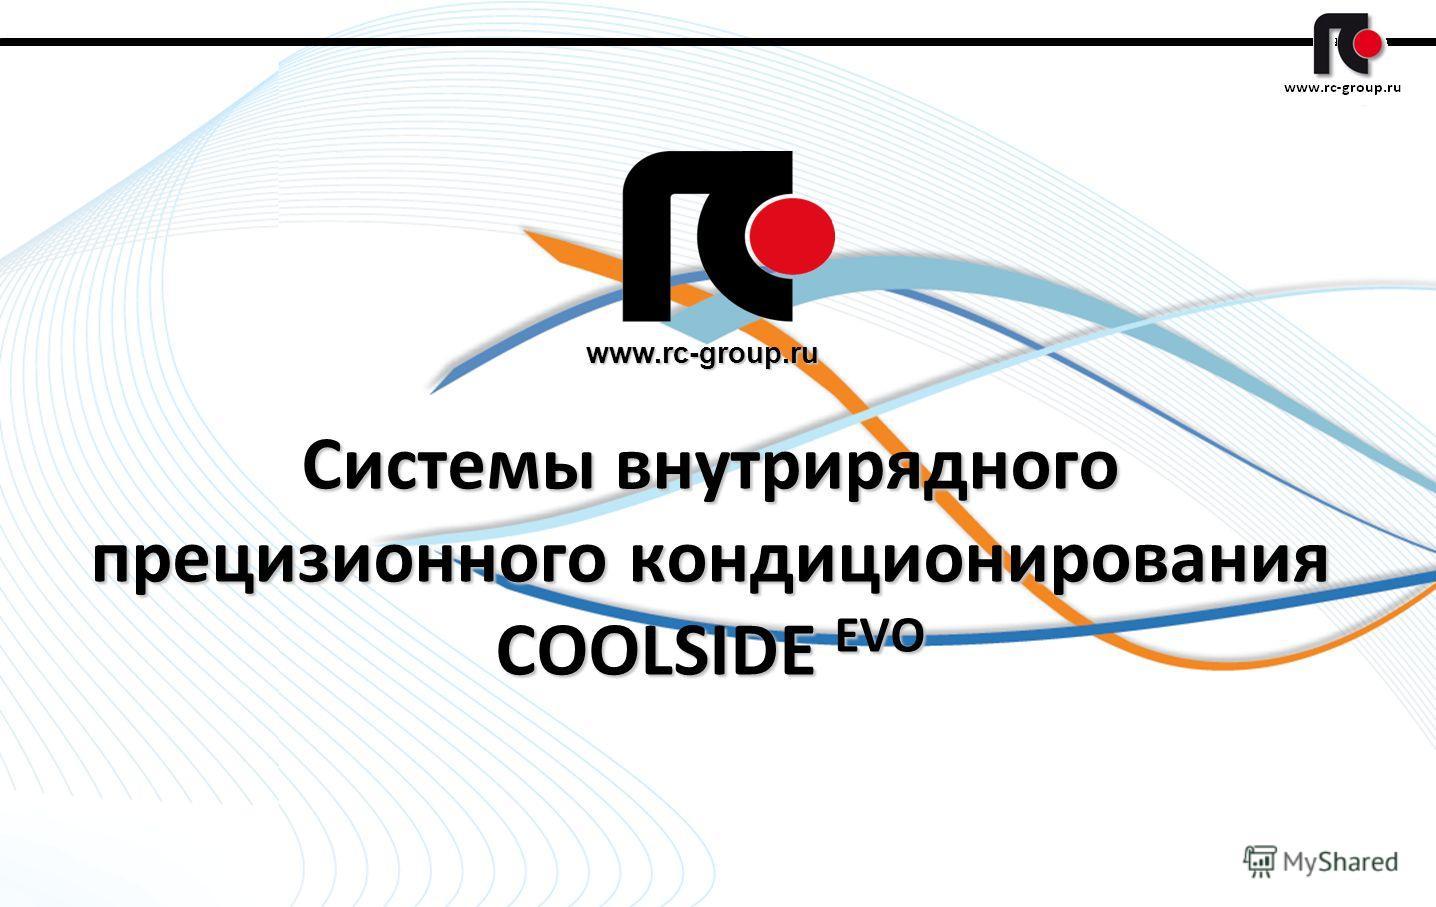 1 www.rc-group.ru Системы внутрирядного прецизионного кондиционирования COOLSIDE EVO